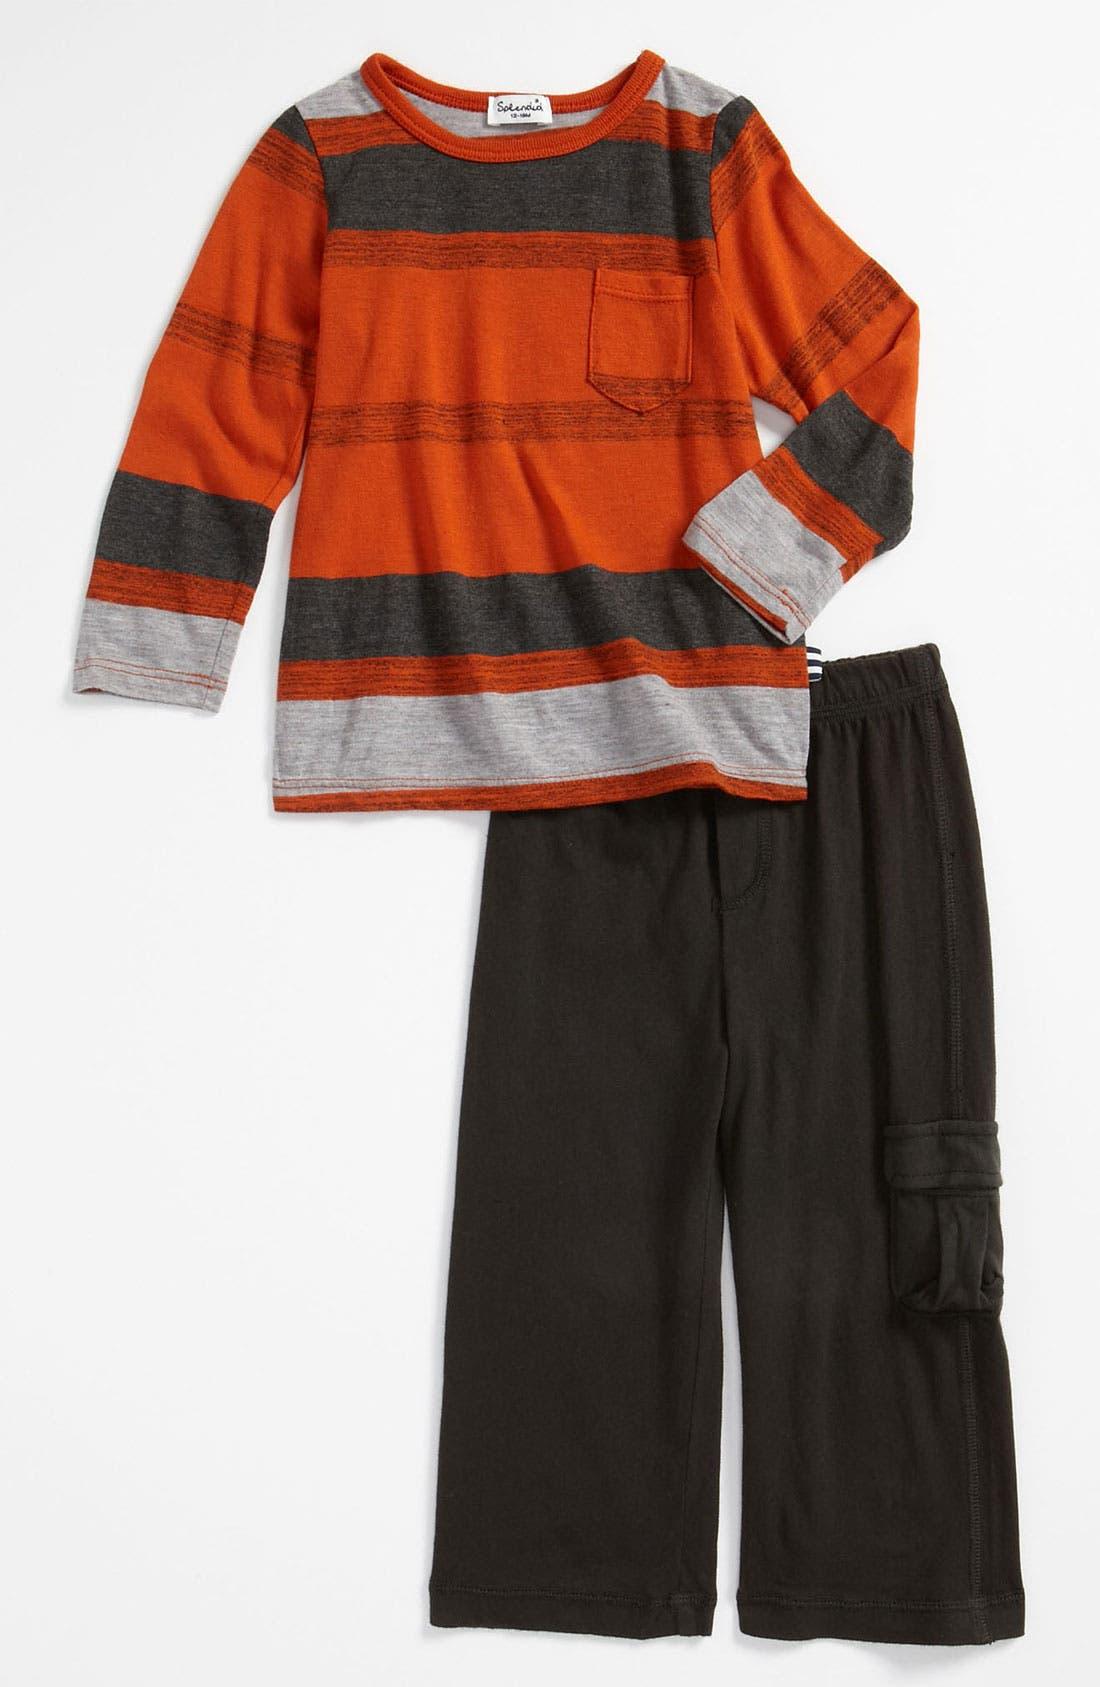 Alternate Image 1 Selected - Splendid 'Rustic Canyon Stripe' T-Shirt & Leggings (Infant)